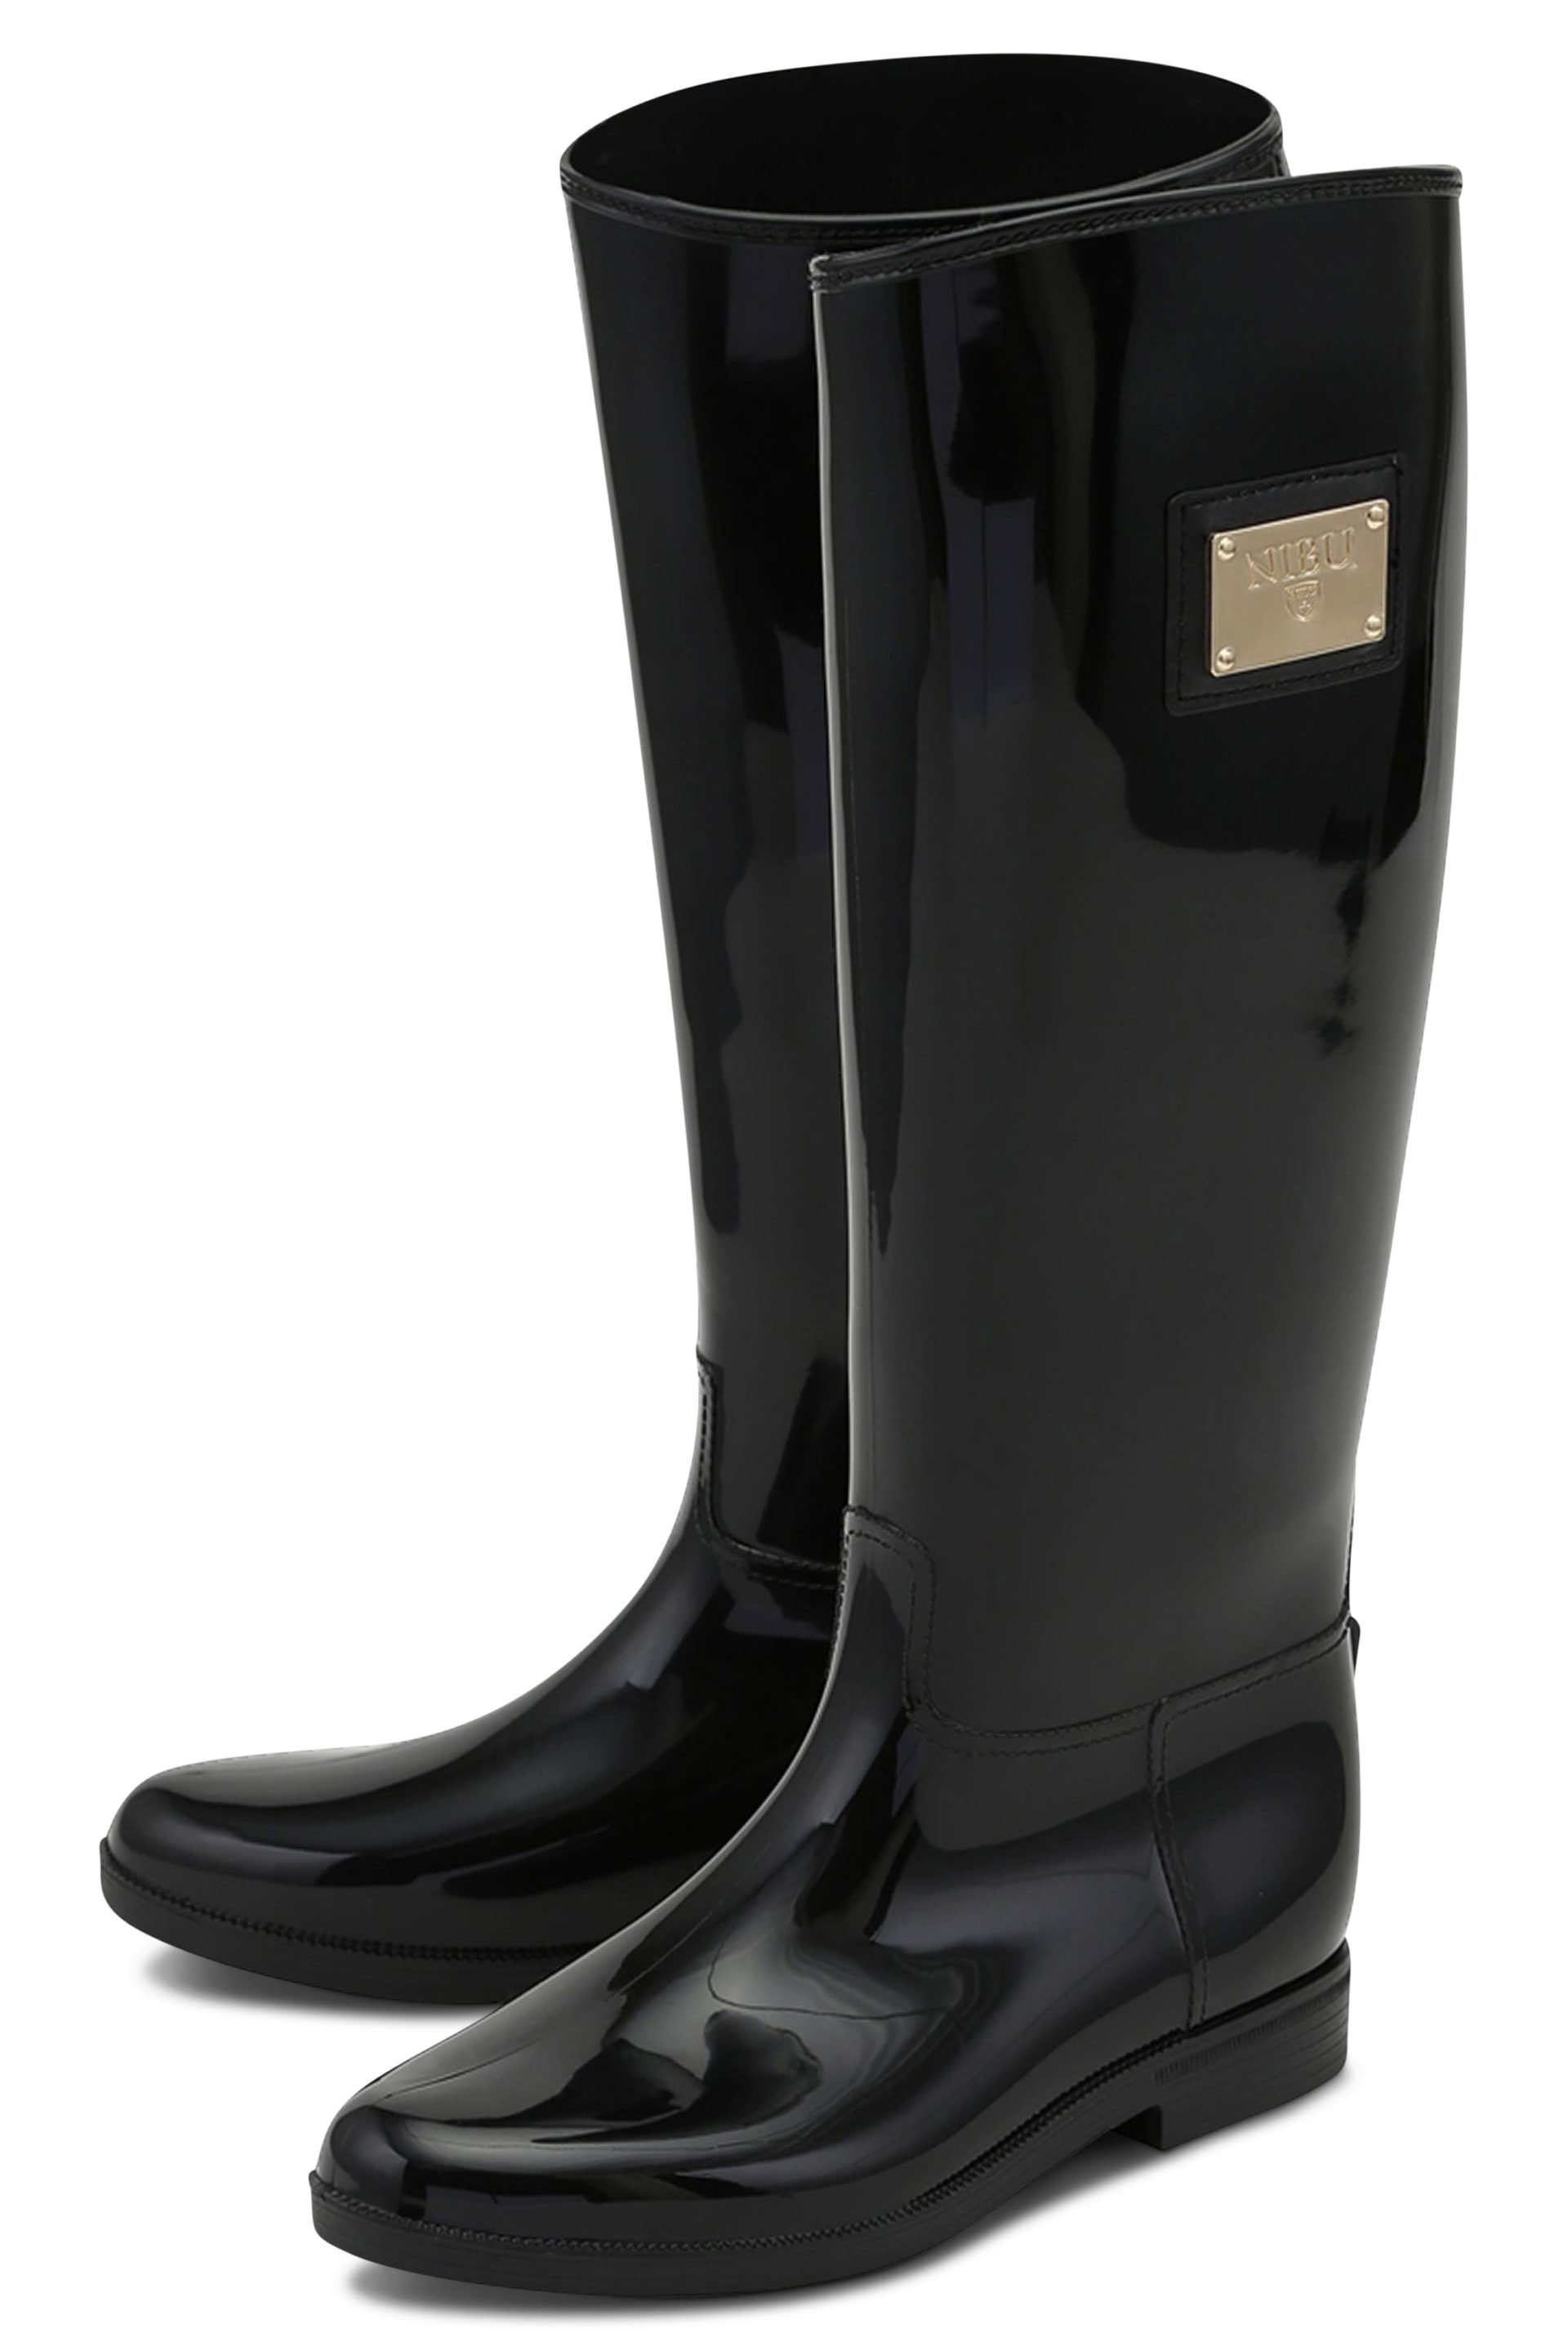 Black hi-shine rainboots with gold-colour logo